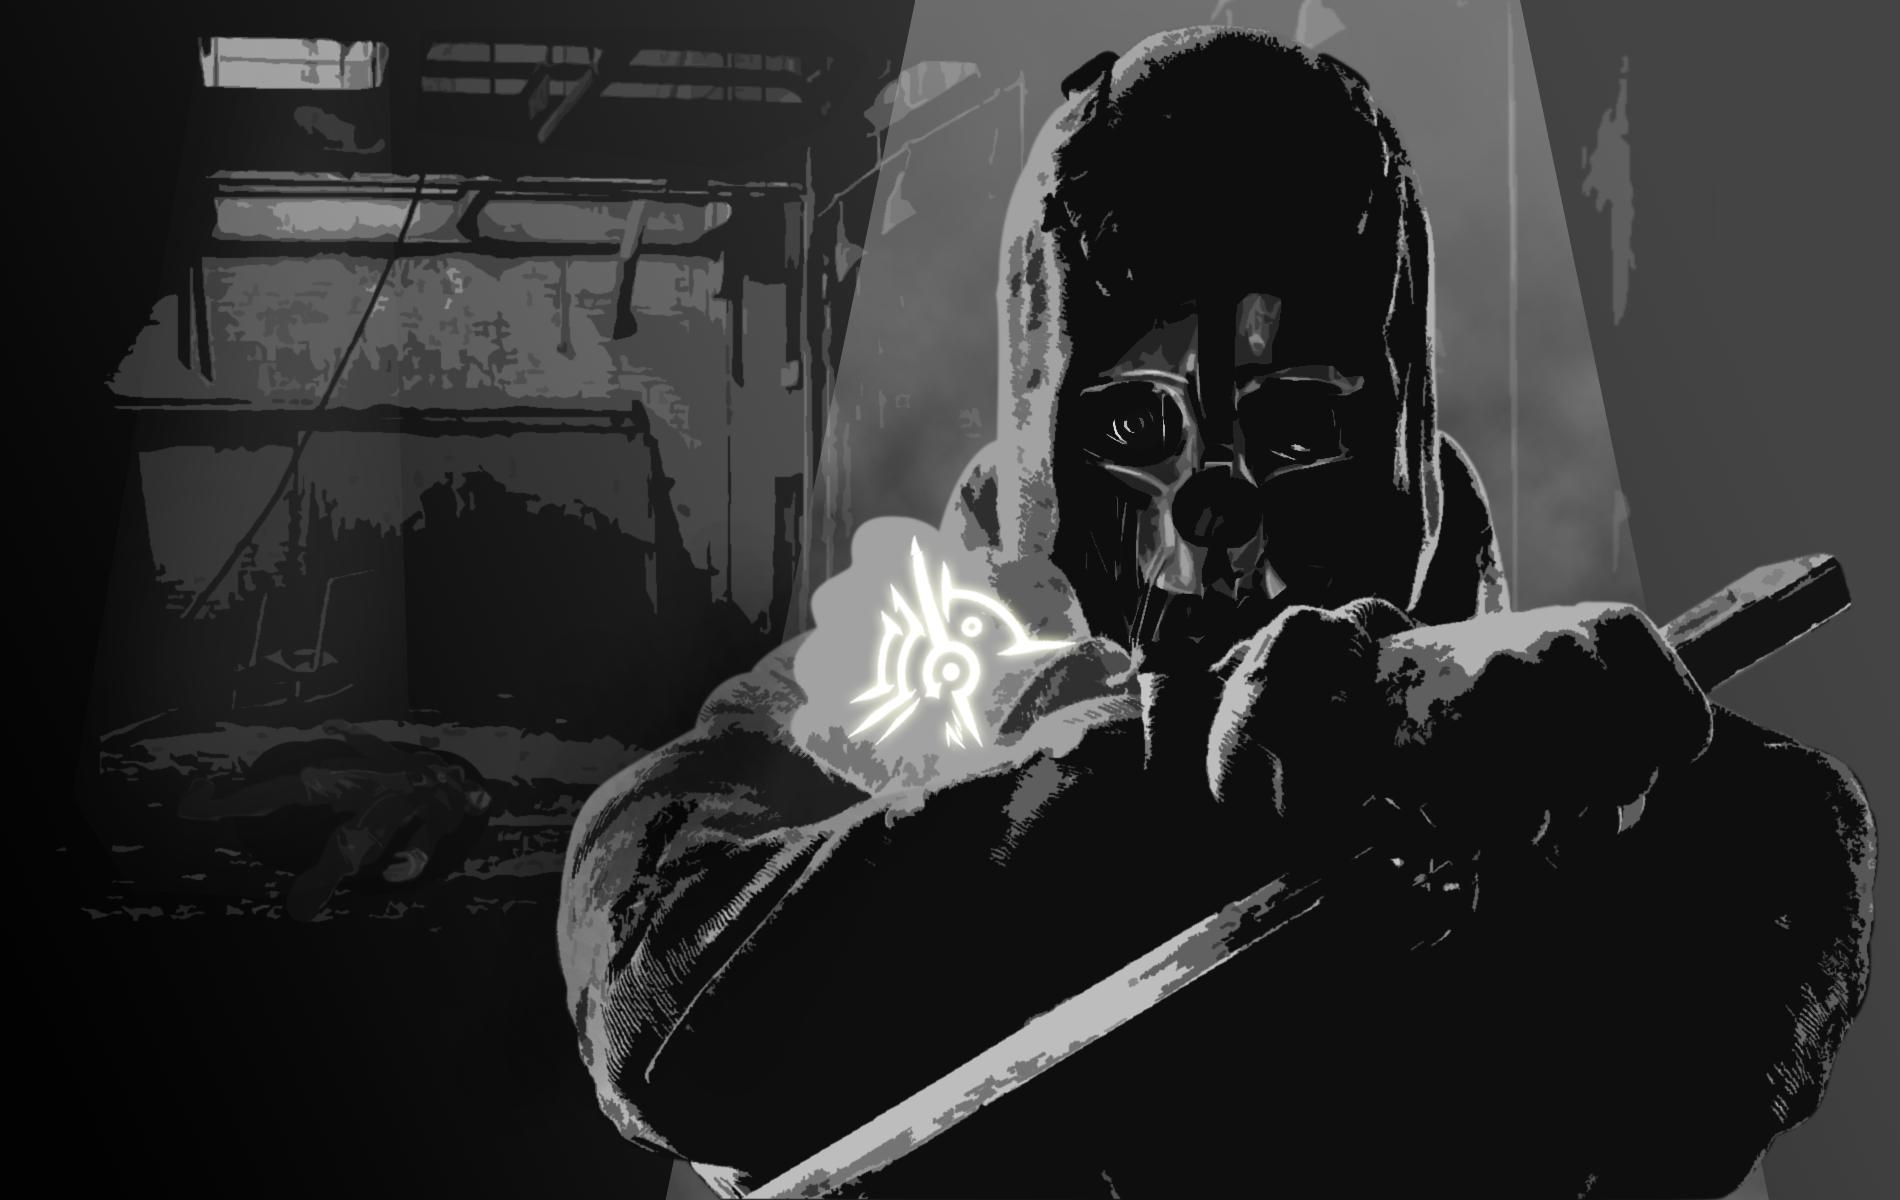 Smoke and Shadows by Zalgroth